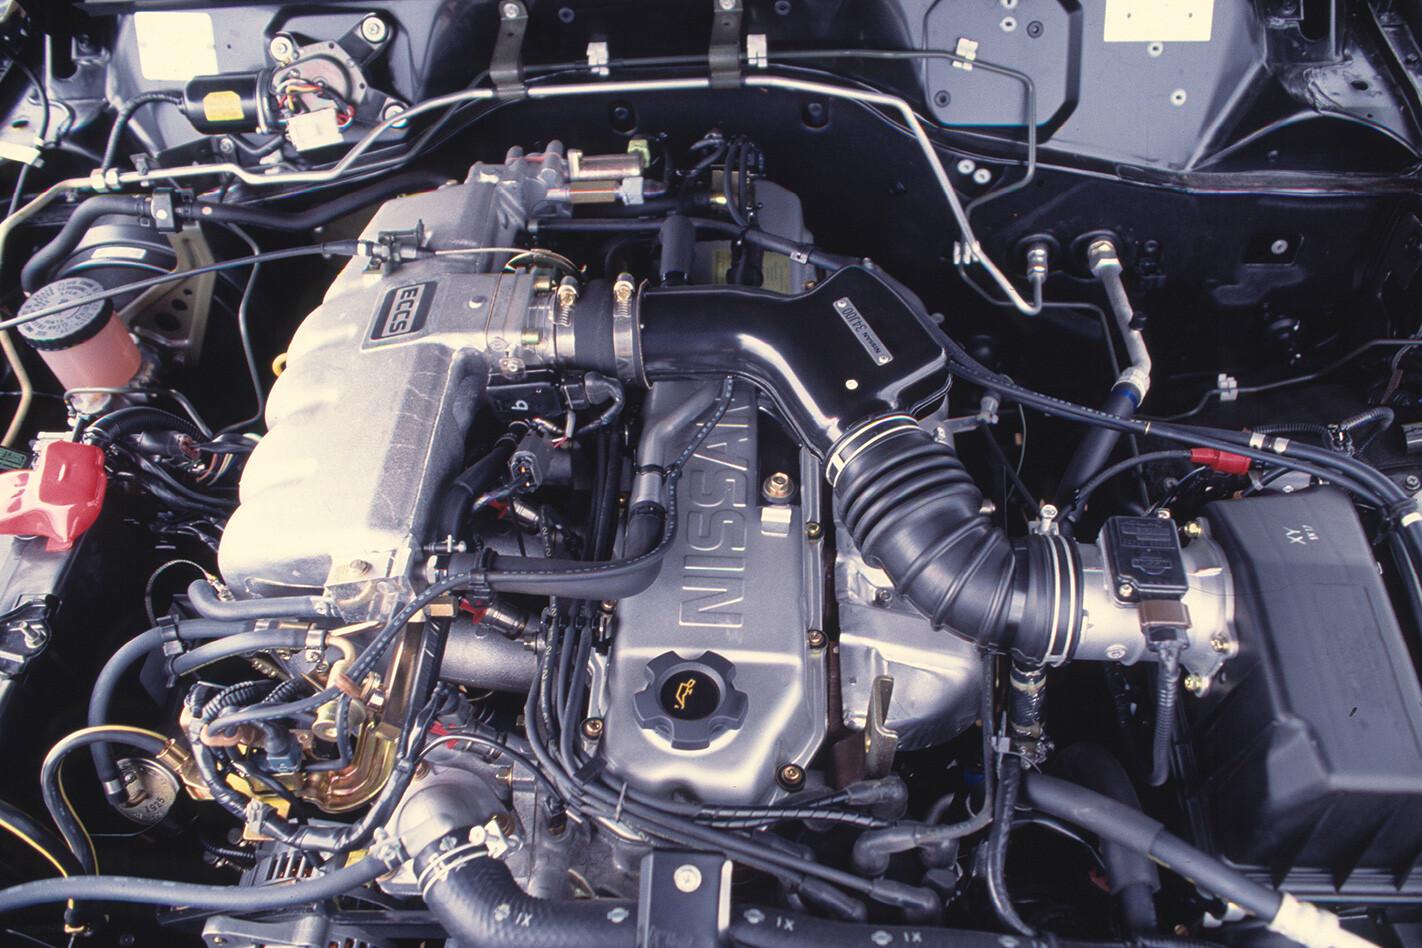 Nissan-Patrol-GQ-engine.jpg